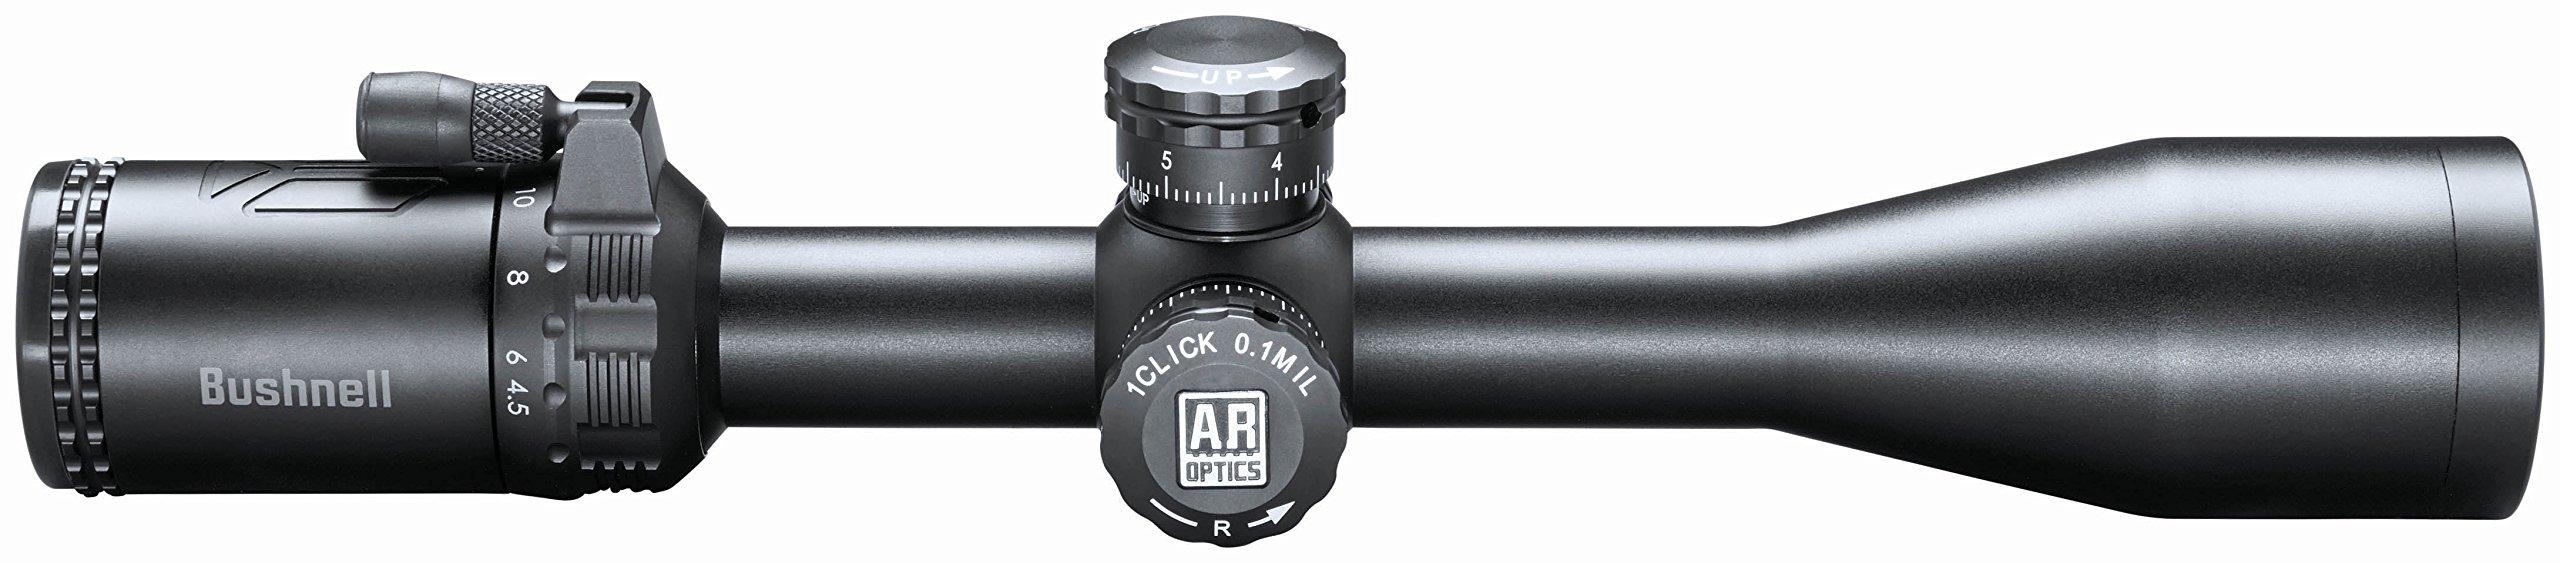 Bushnell AR Optics, 4.5-18X40  DZ 6.5 Creed, Box 6L by Bushnell